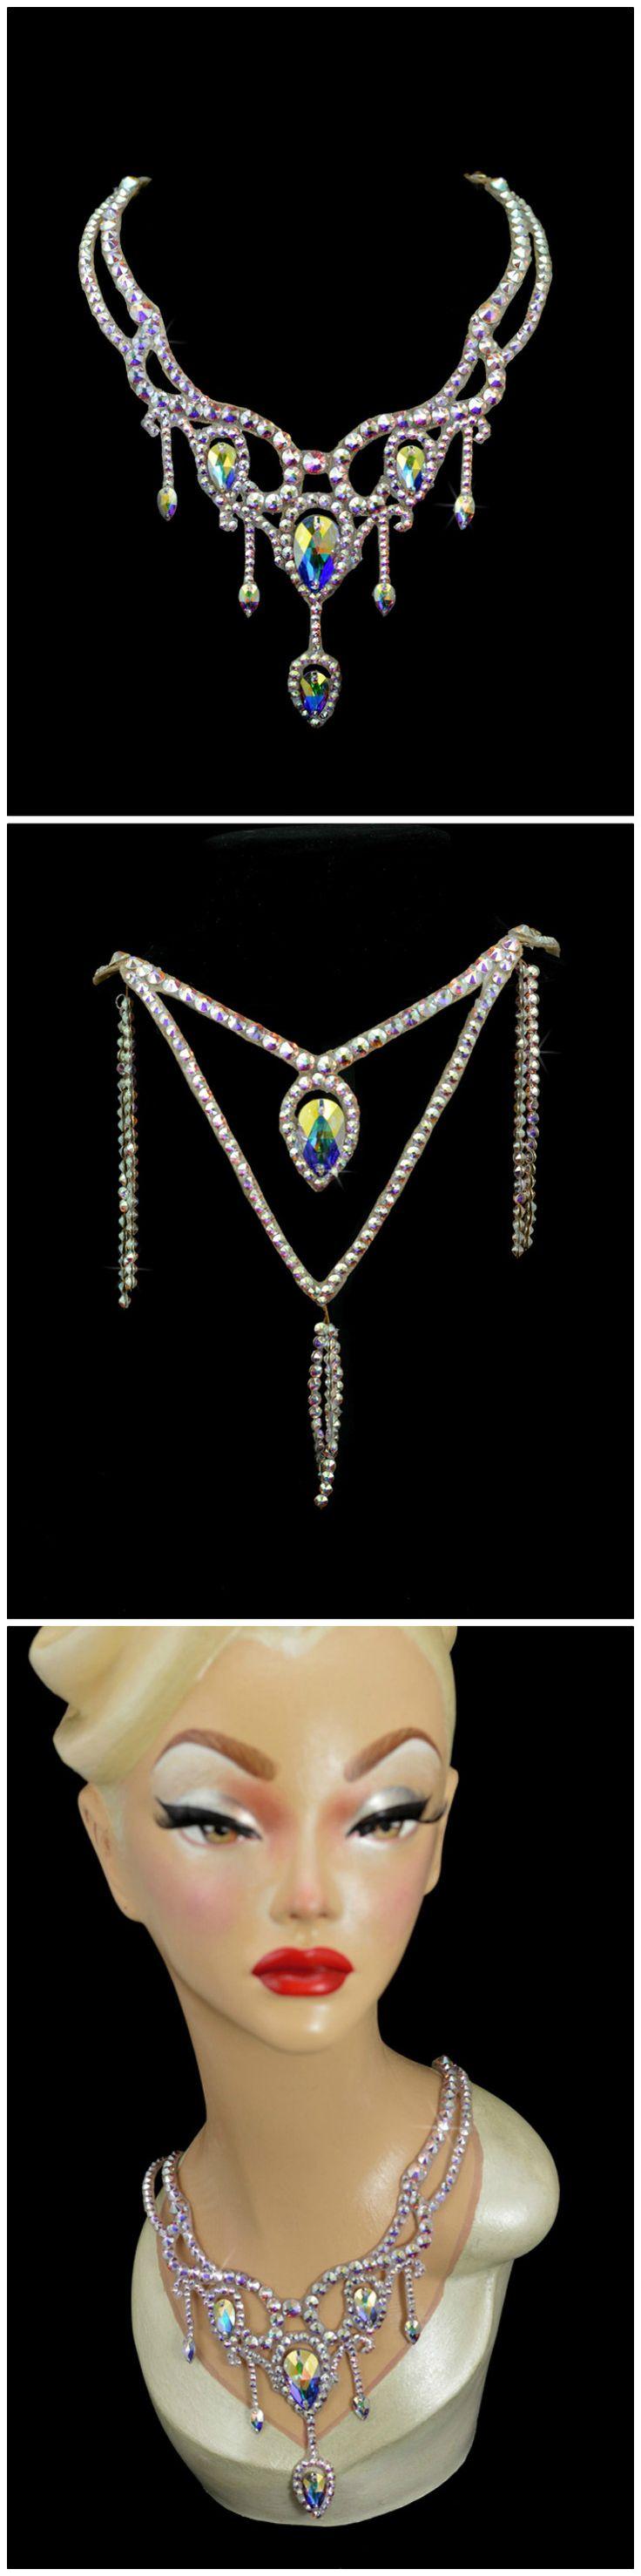 """Jump., Jive an' Wail"" - Swarovski ballroom necklace. Ballroom jewelry, ballroom accessories. Handmade in Canada. www.tzafora.com Copyright © Tzafora"